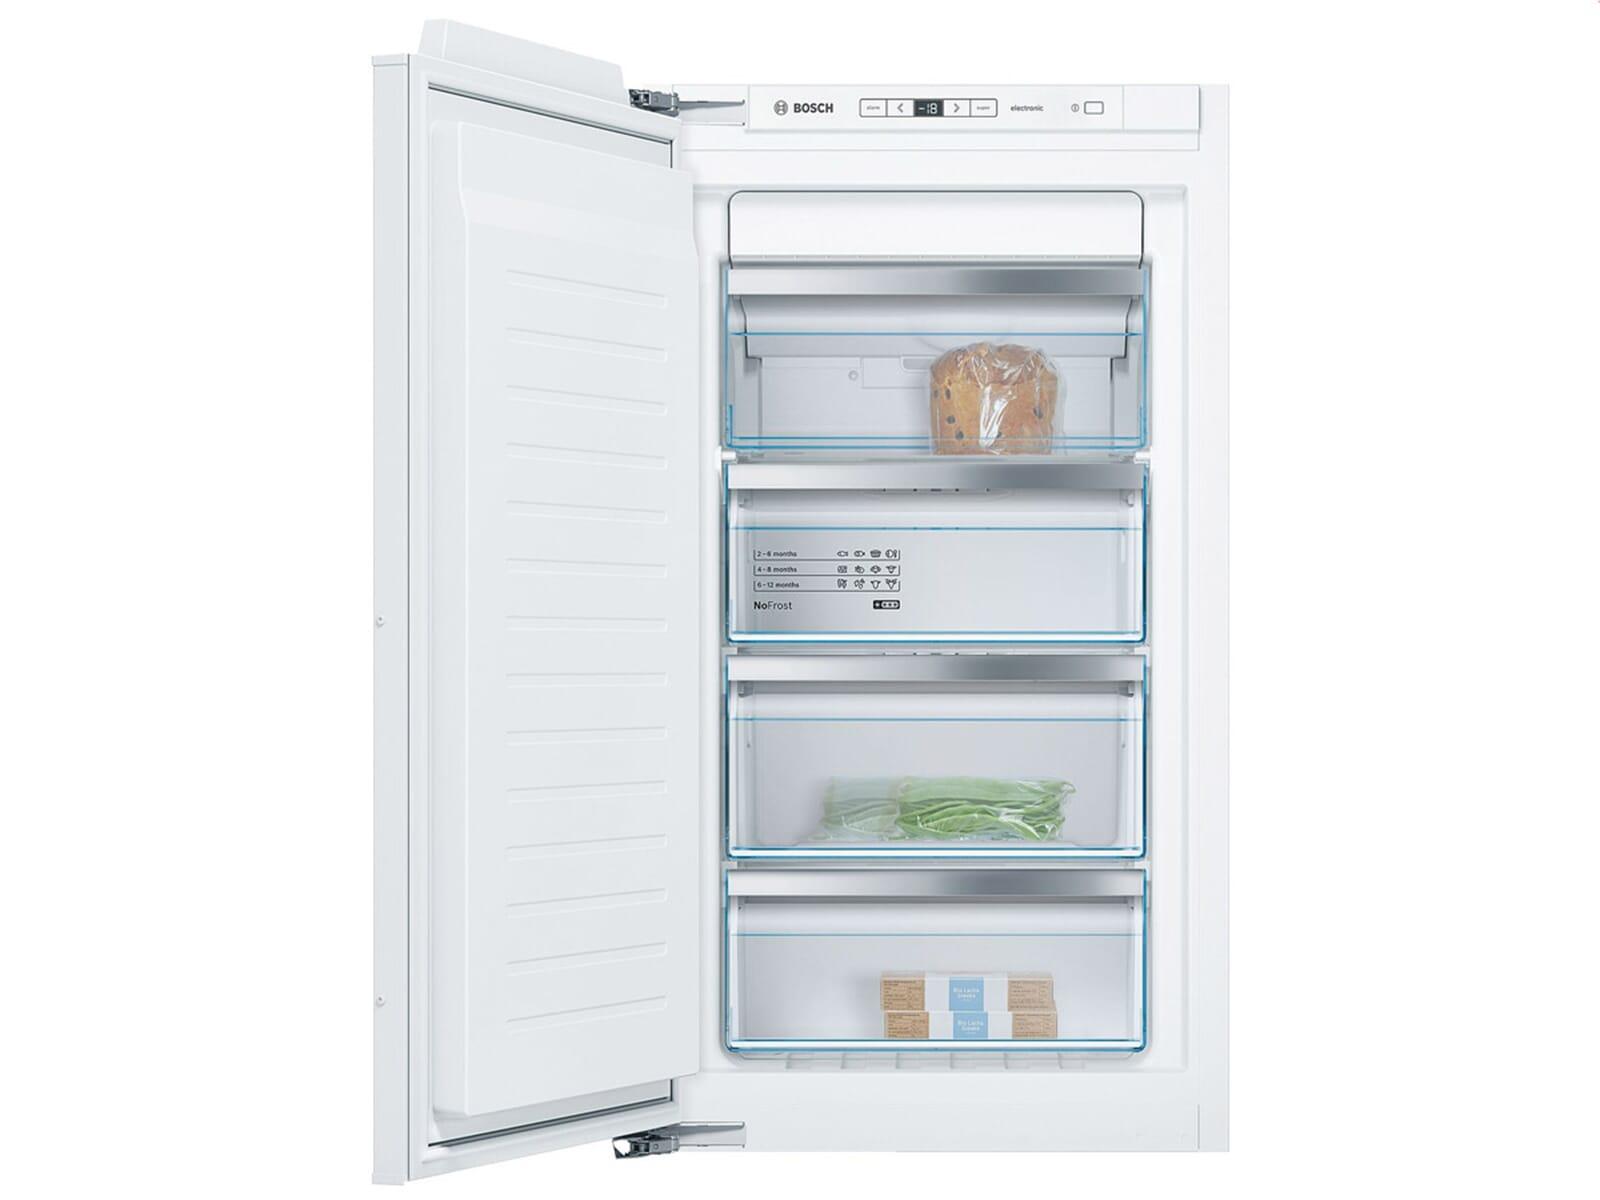 Bosch Kühlschrank Qc 421 : Bosch no frost kühlschrank alarm: bosch kühl gefrierkombination